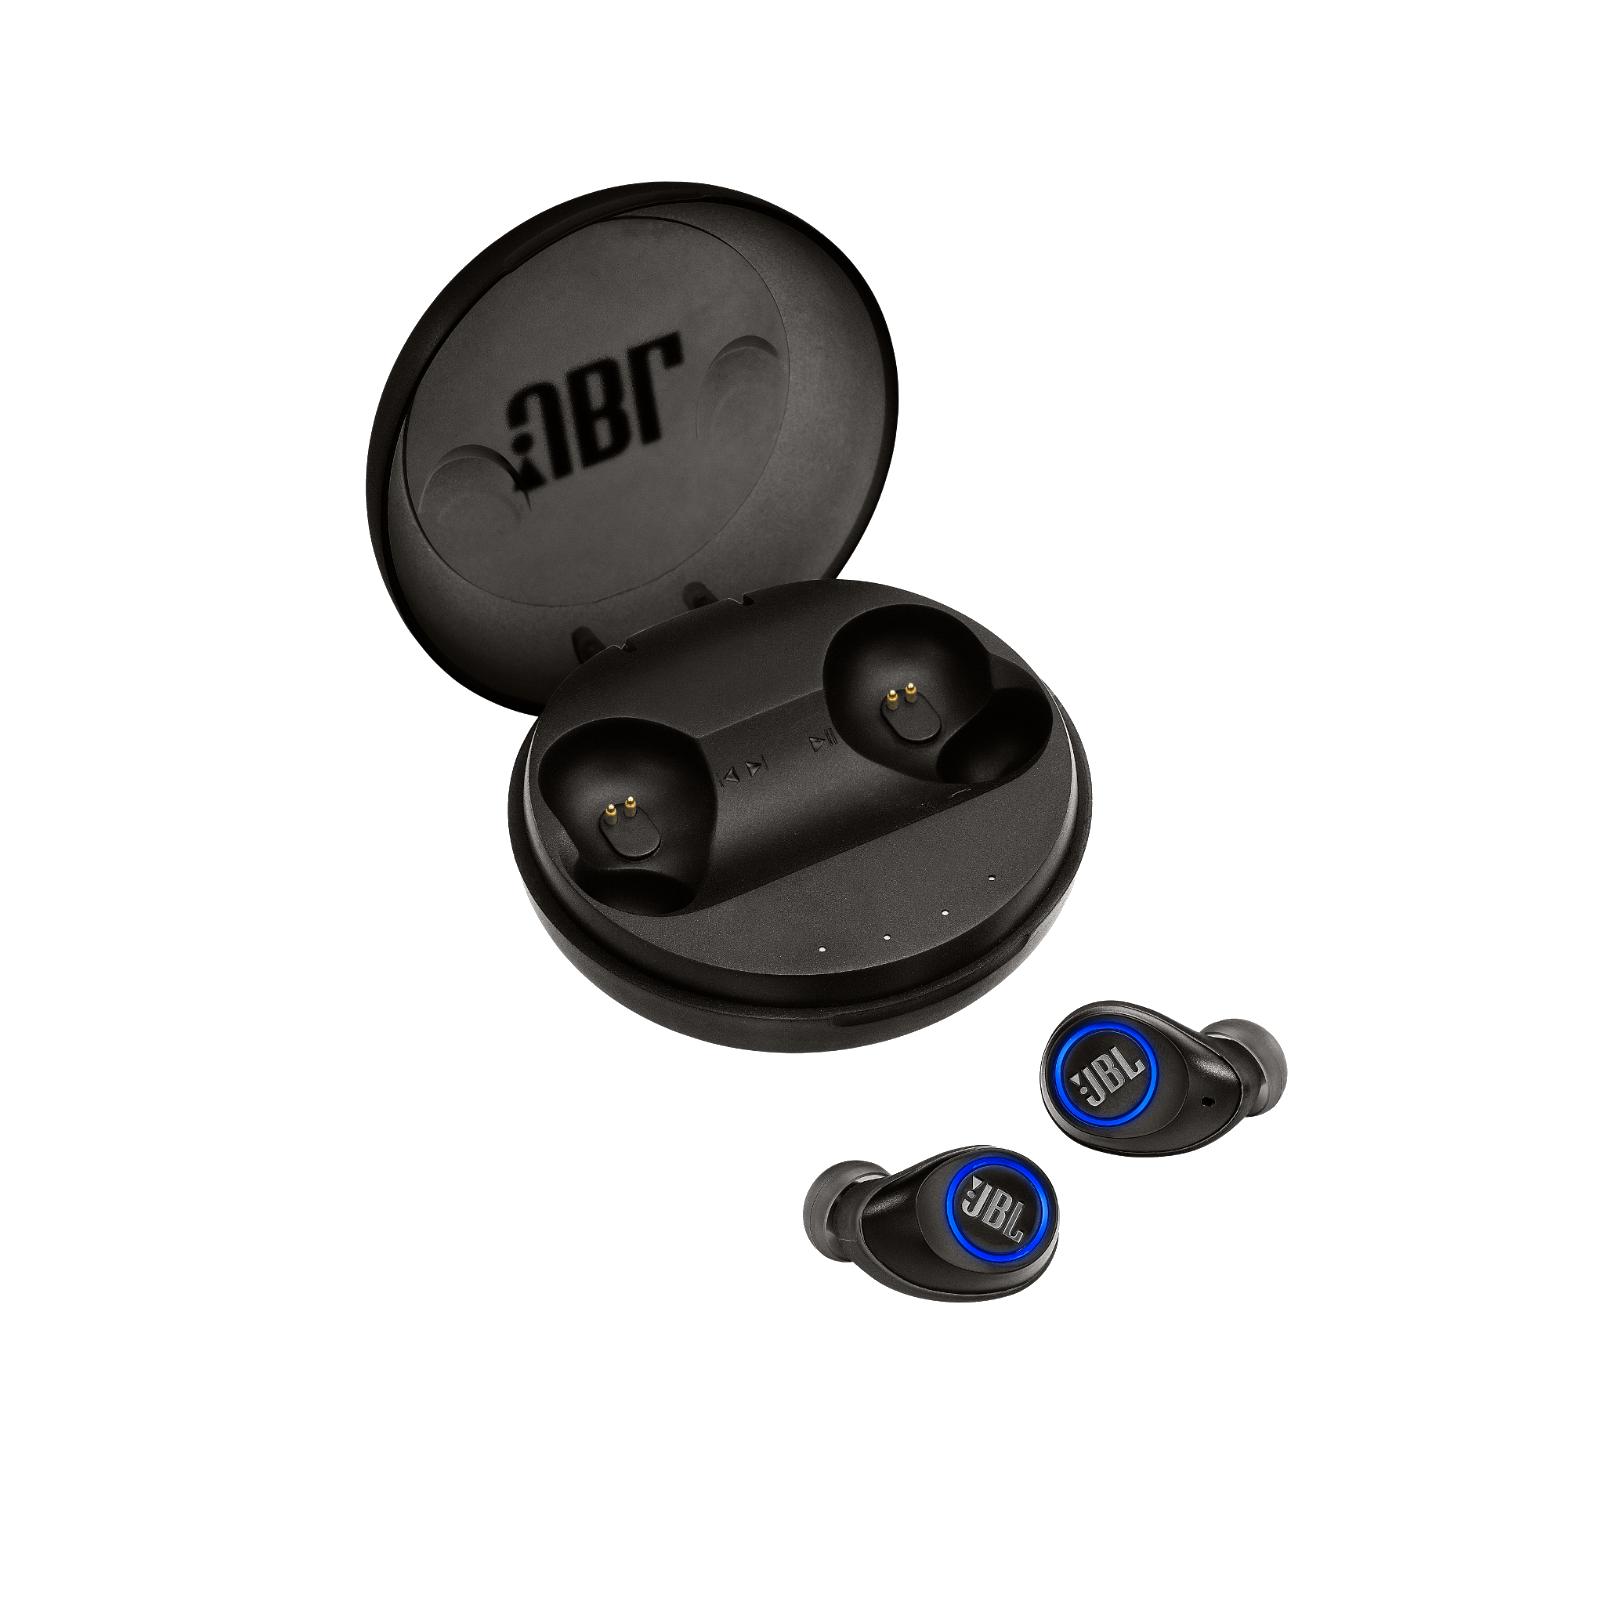 JBL Free X ear buds replacement Kit - Black - JBL FREE replacement units - Hero